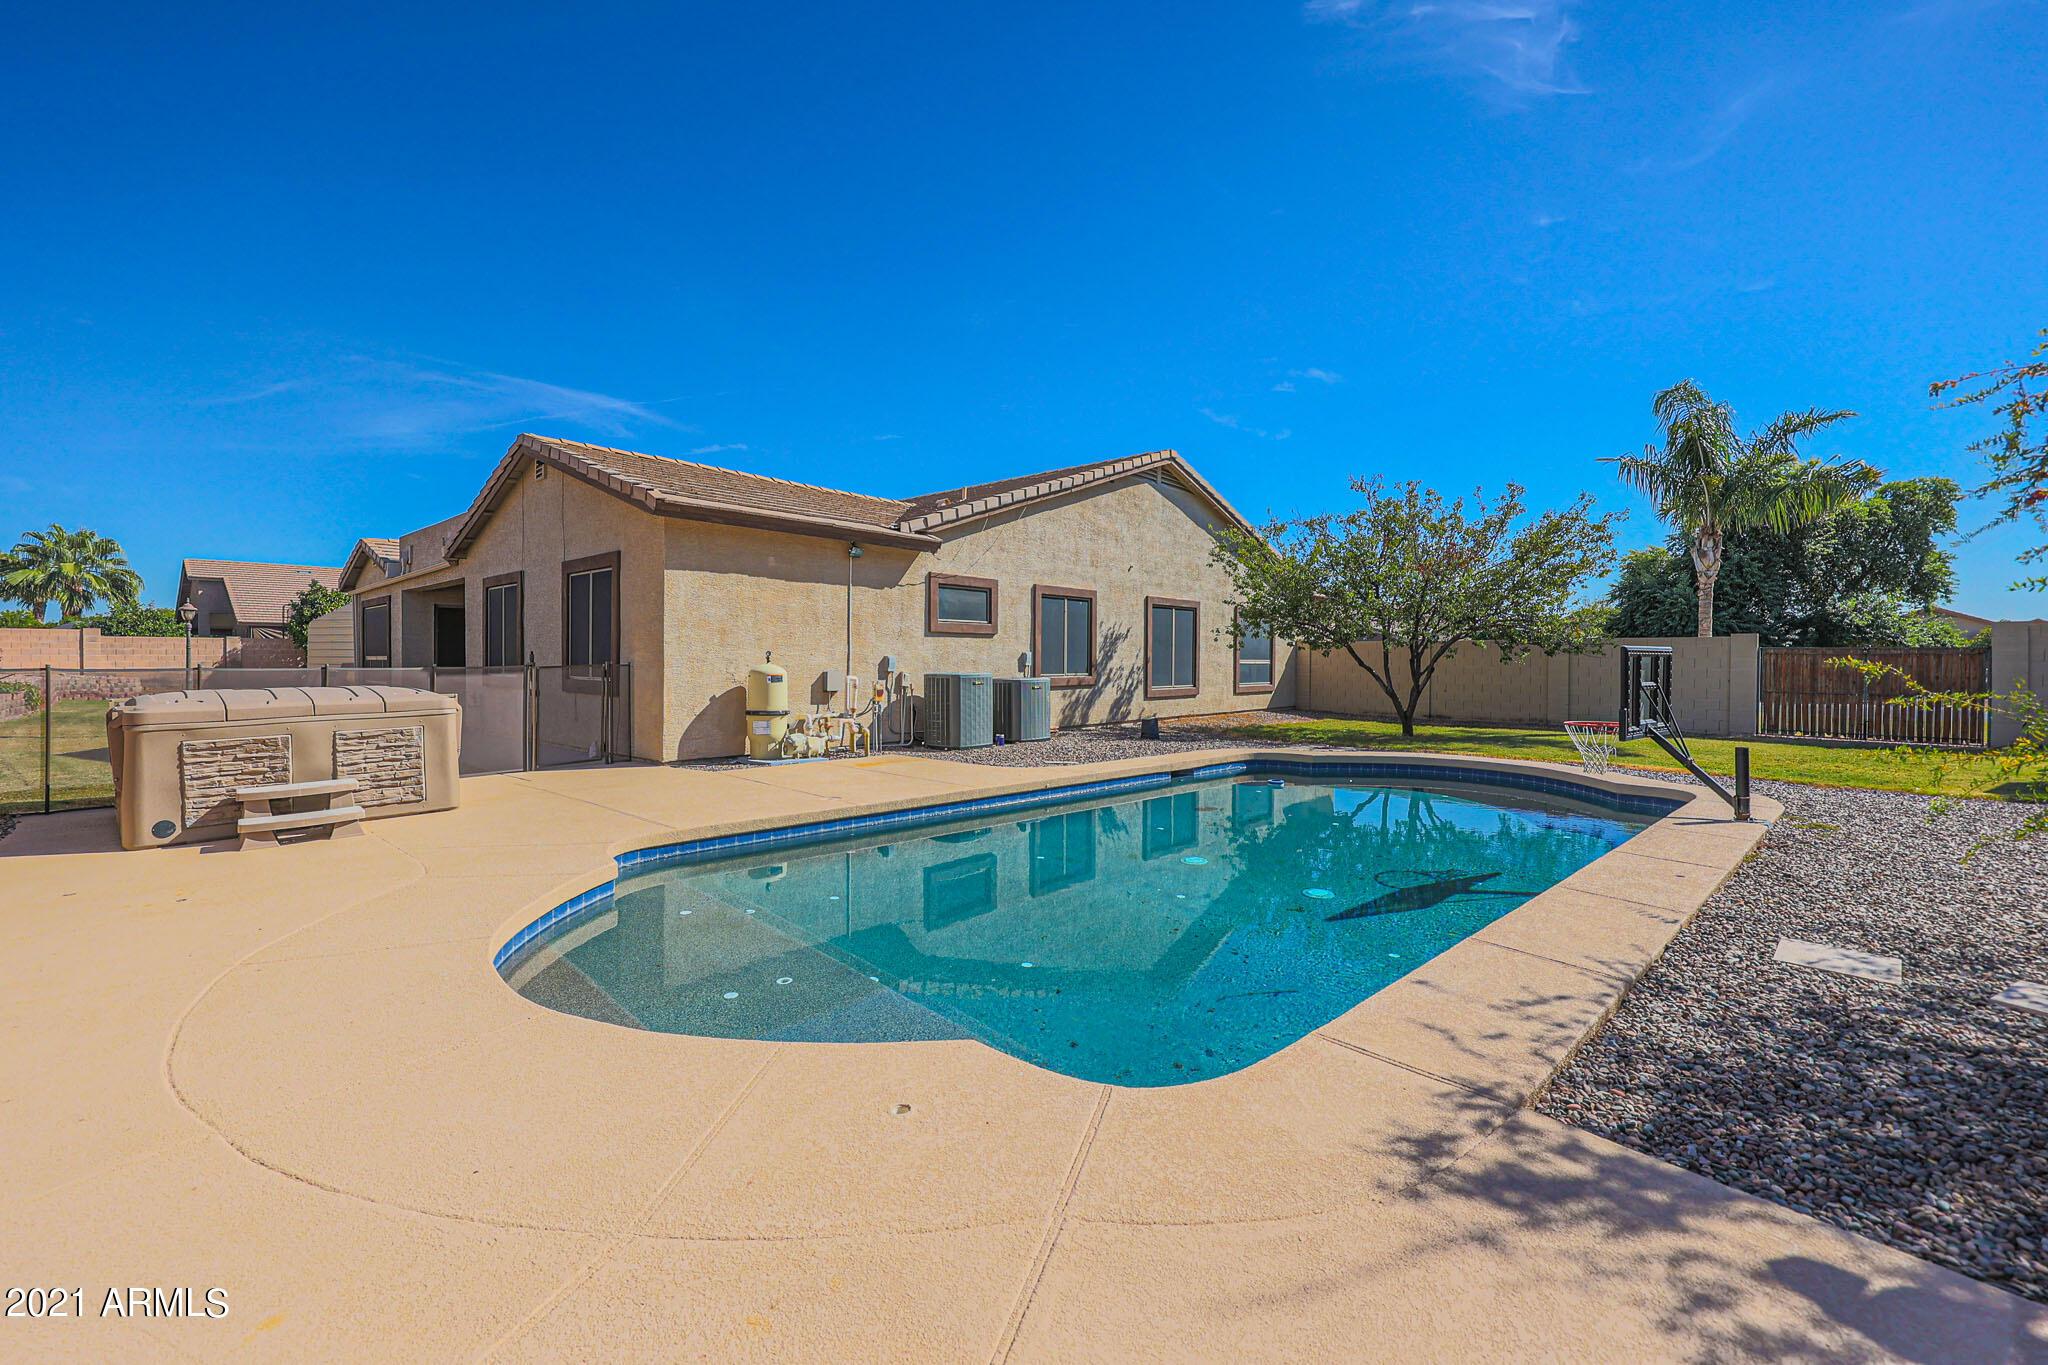 MLS 6311341 8126 W Gardenia Avenue, Glendale, AZ 85303 Glendale AZ Central Glendale